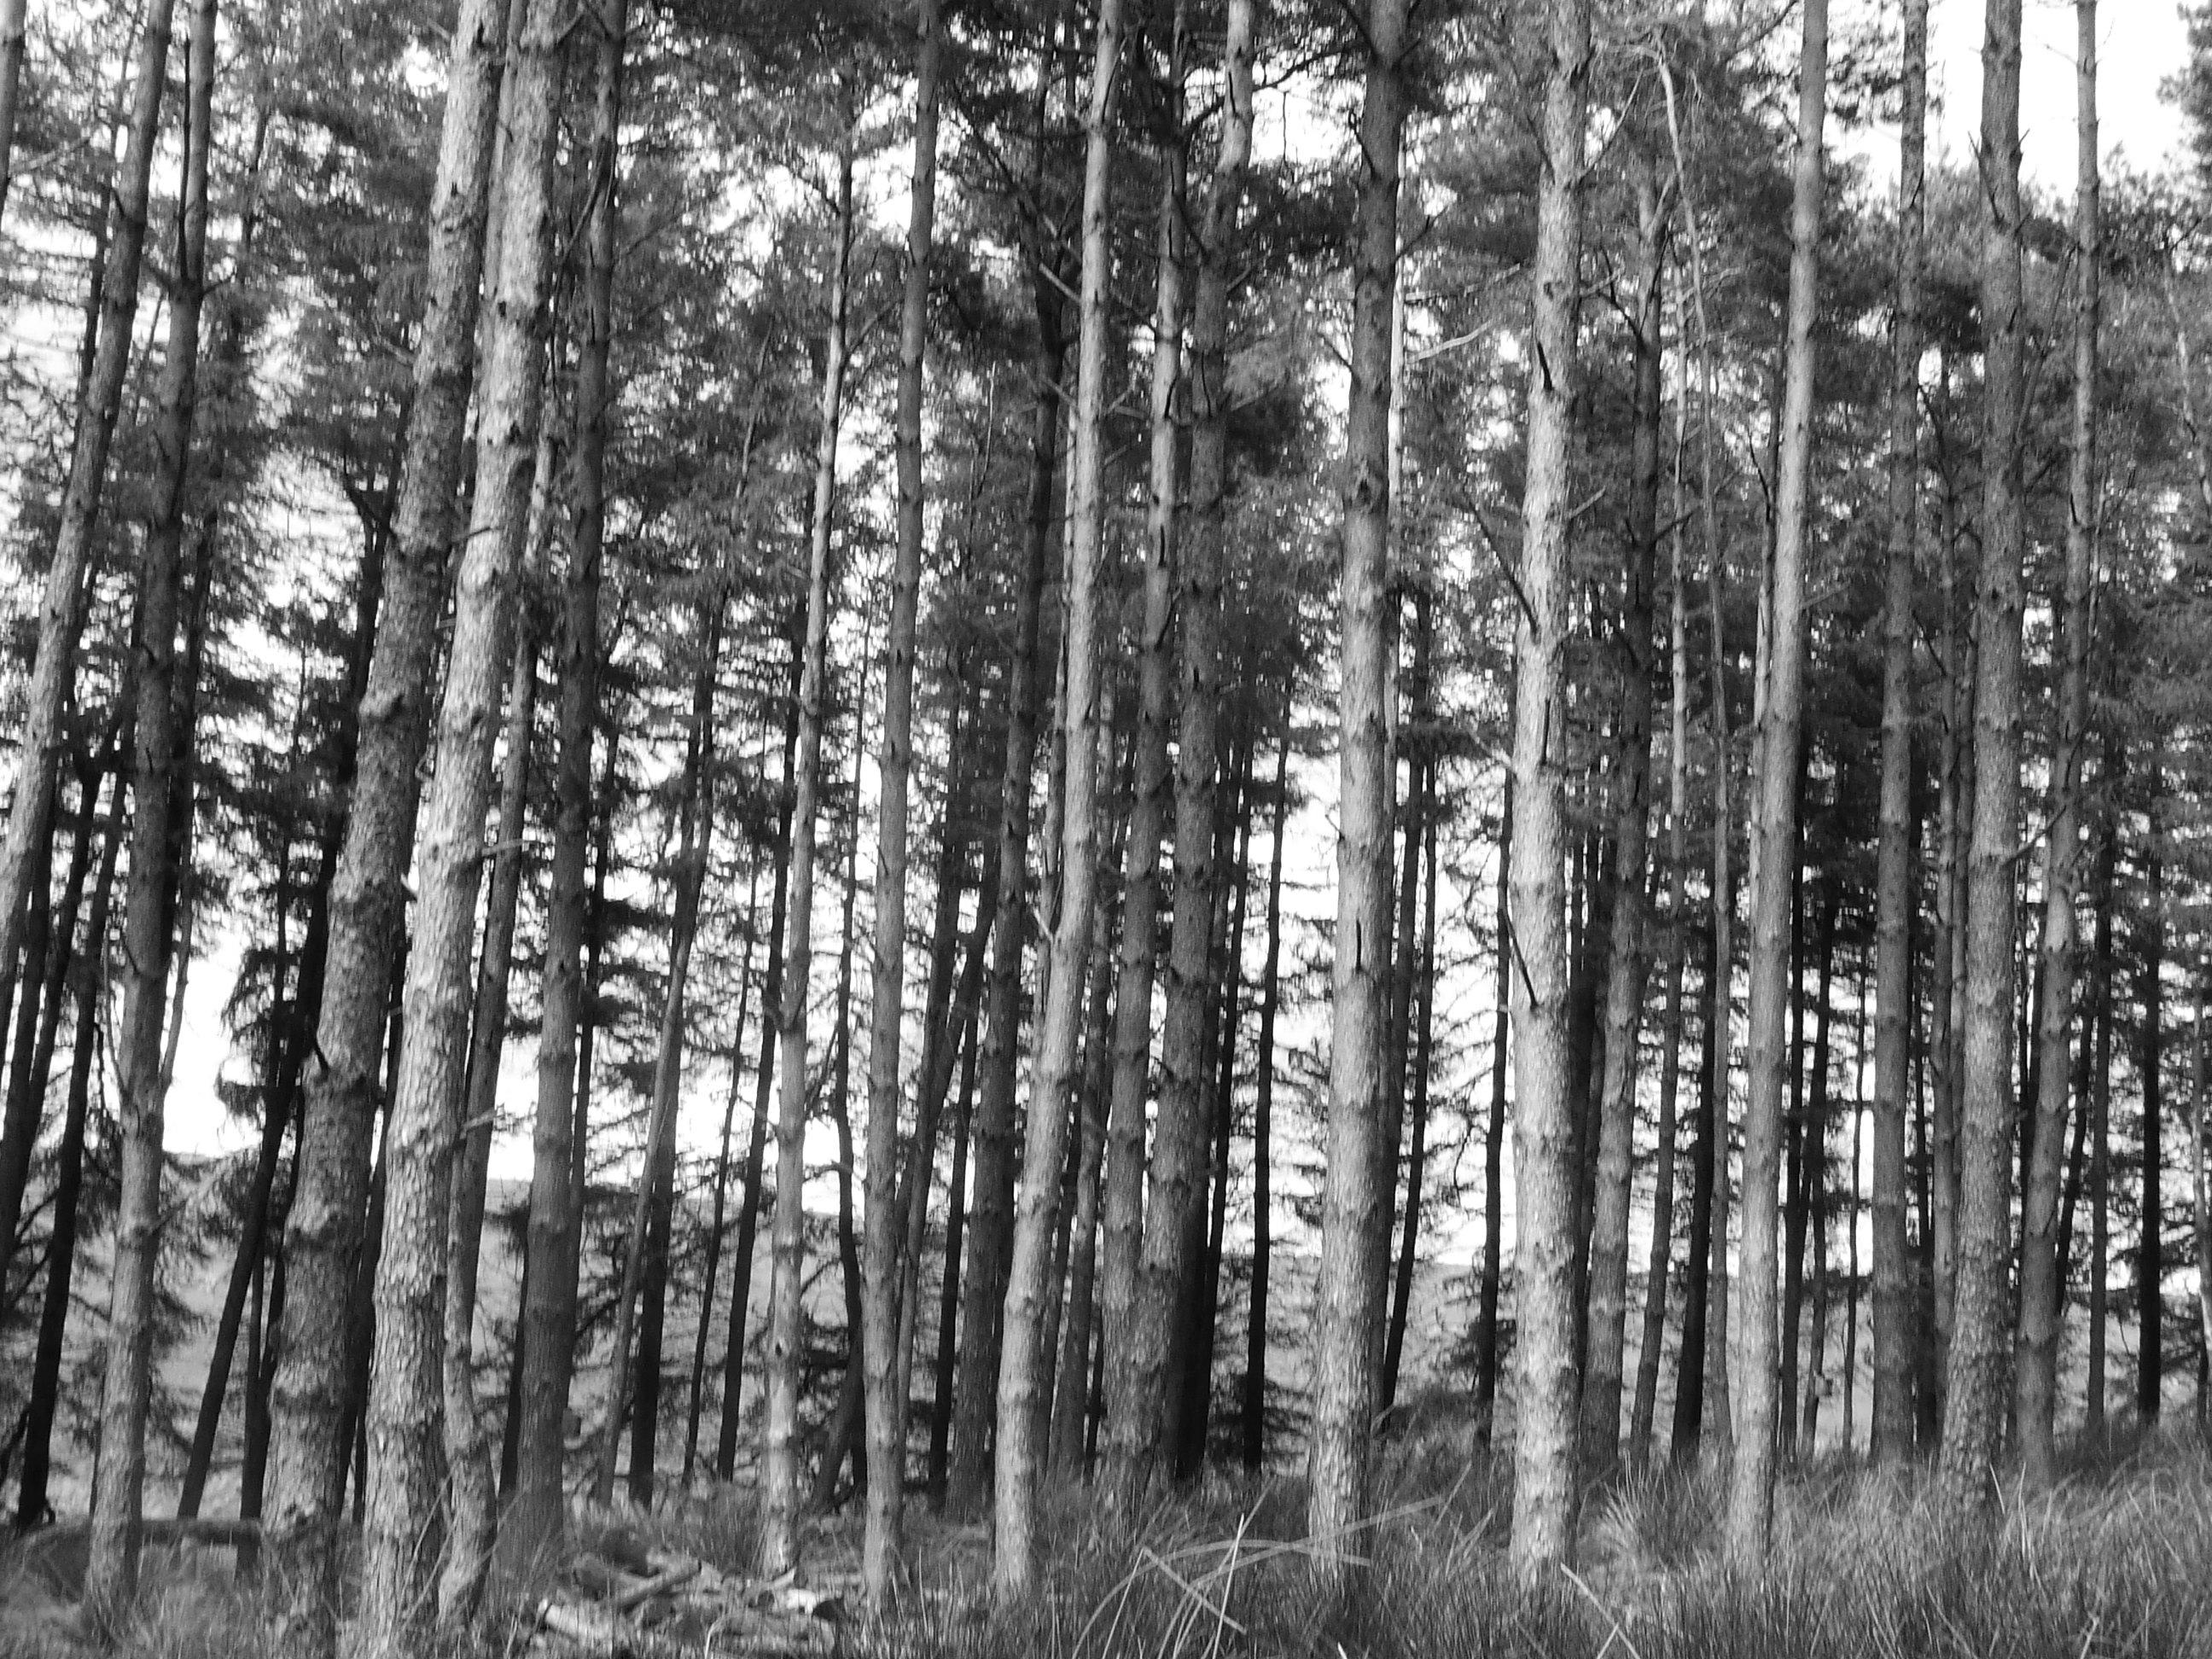 white pine black personals Morgantown materials - craigslist cl morgantown   materials  post account 0 favorites 0 hidden cl morgantown  favorite this post aug 22 flooring , white.